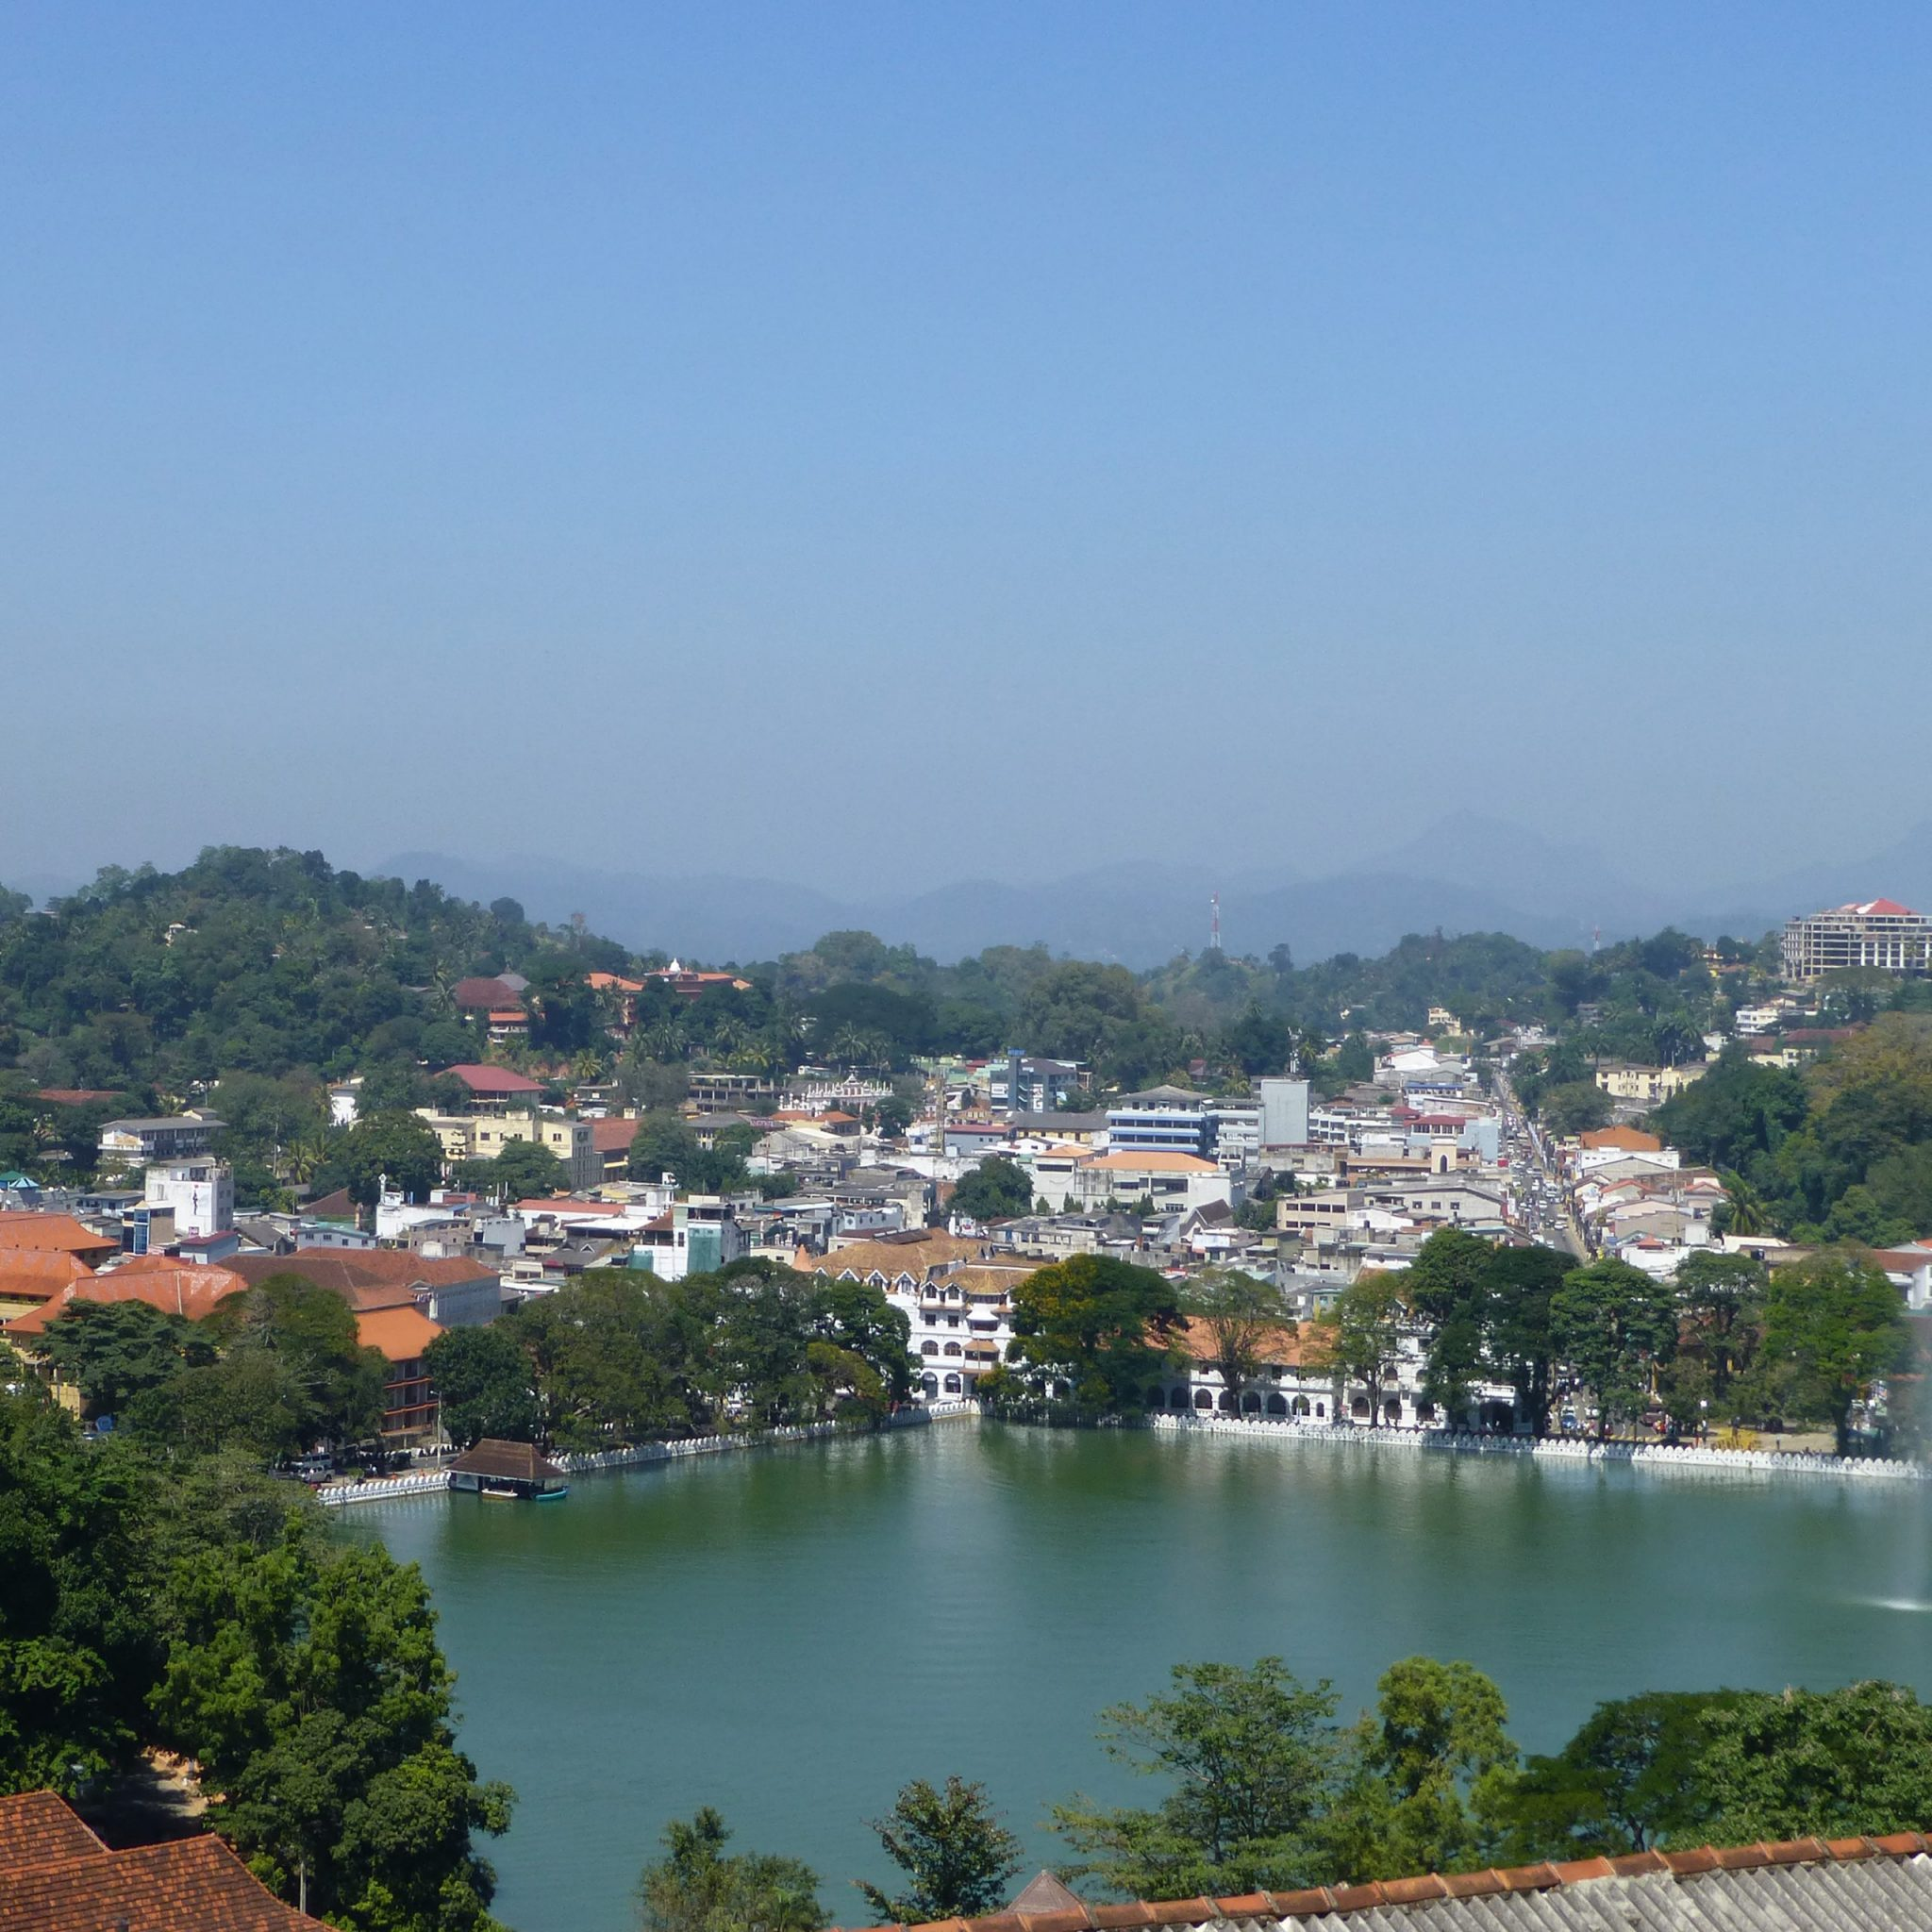 Day 05 - Kandy City Tour